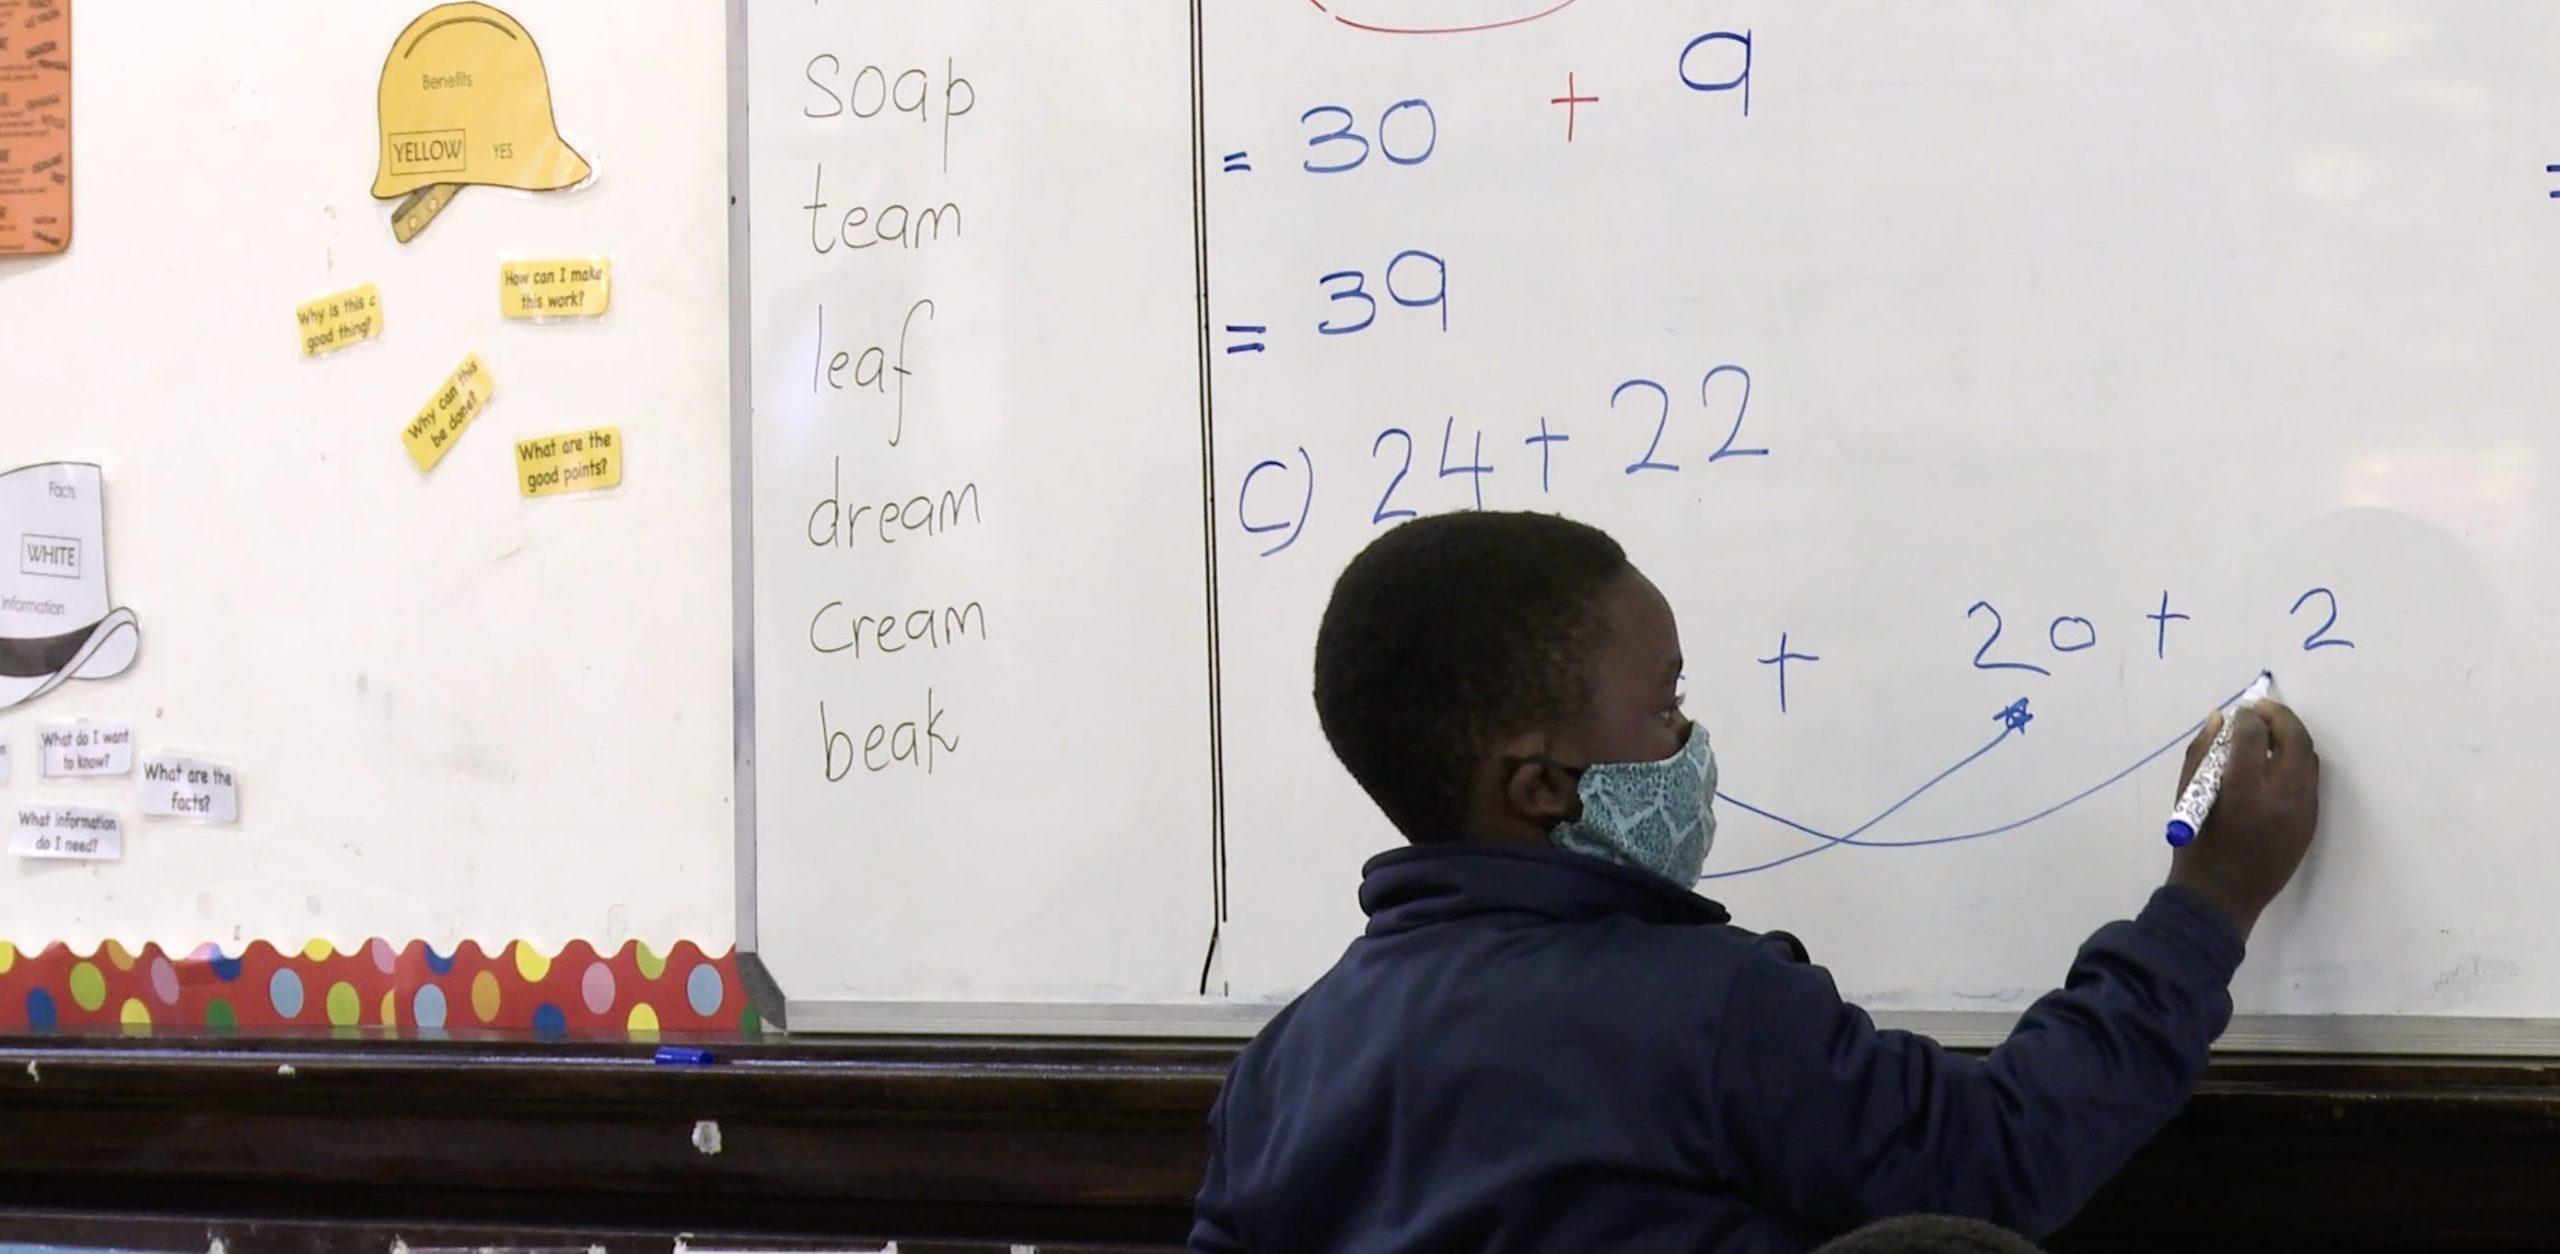 Undocumented migrant children unable to attend school